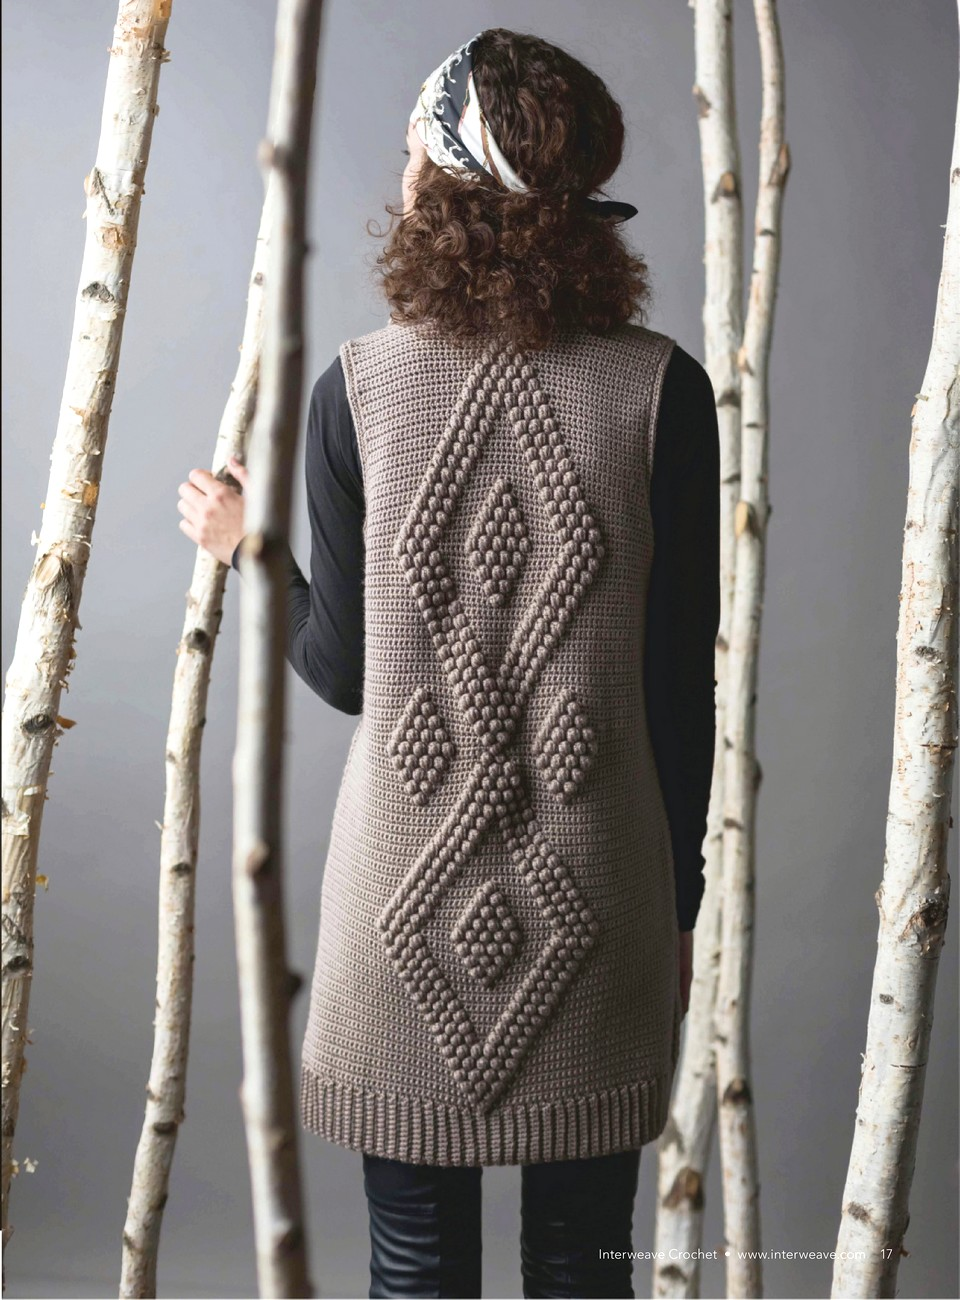 Interweave Crochet Winter 2019-18